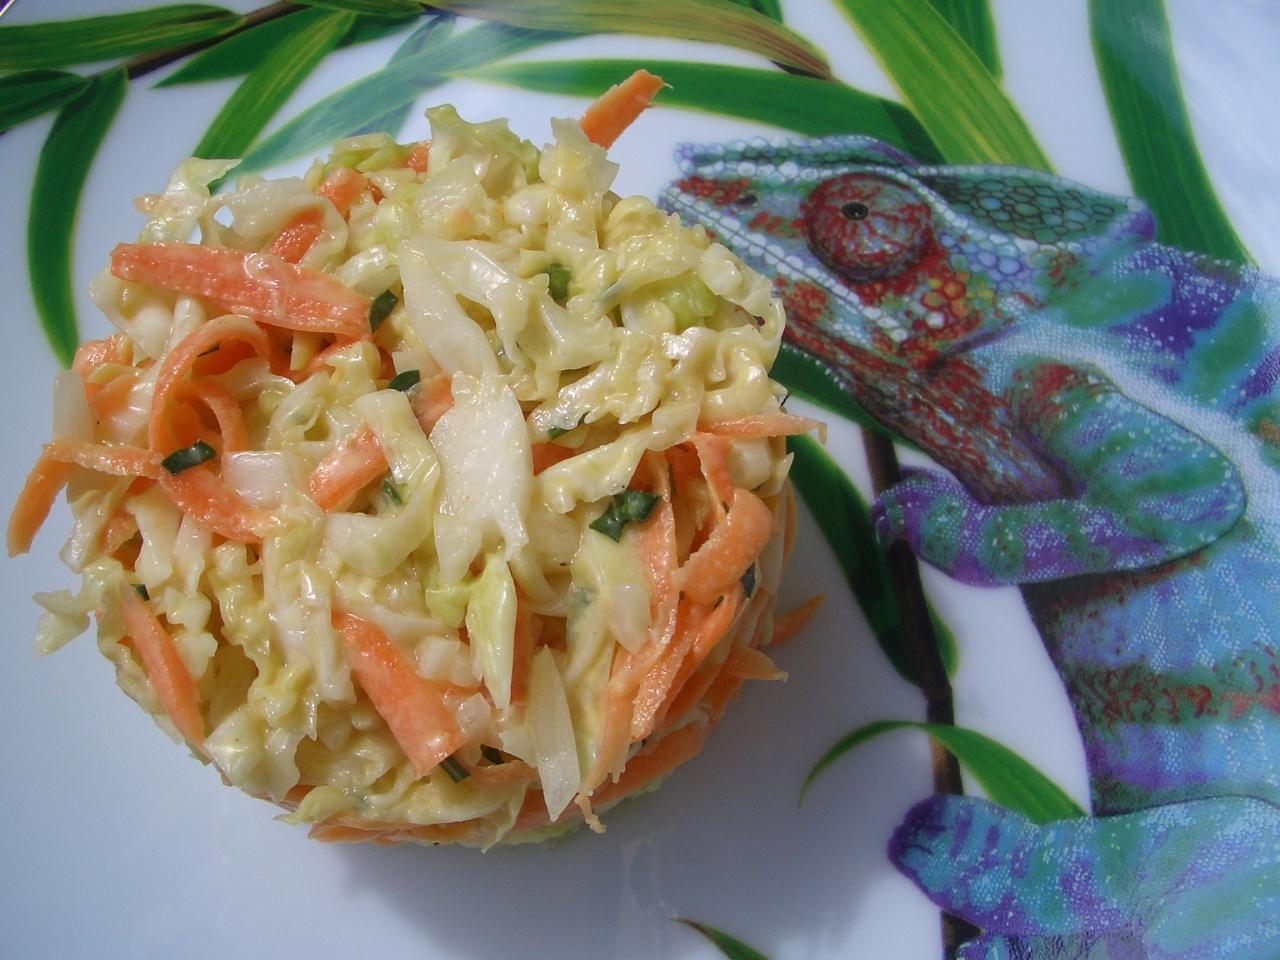 Ensalada Coleslaw – ColeslawSalad